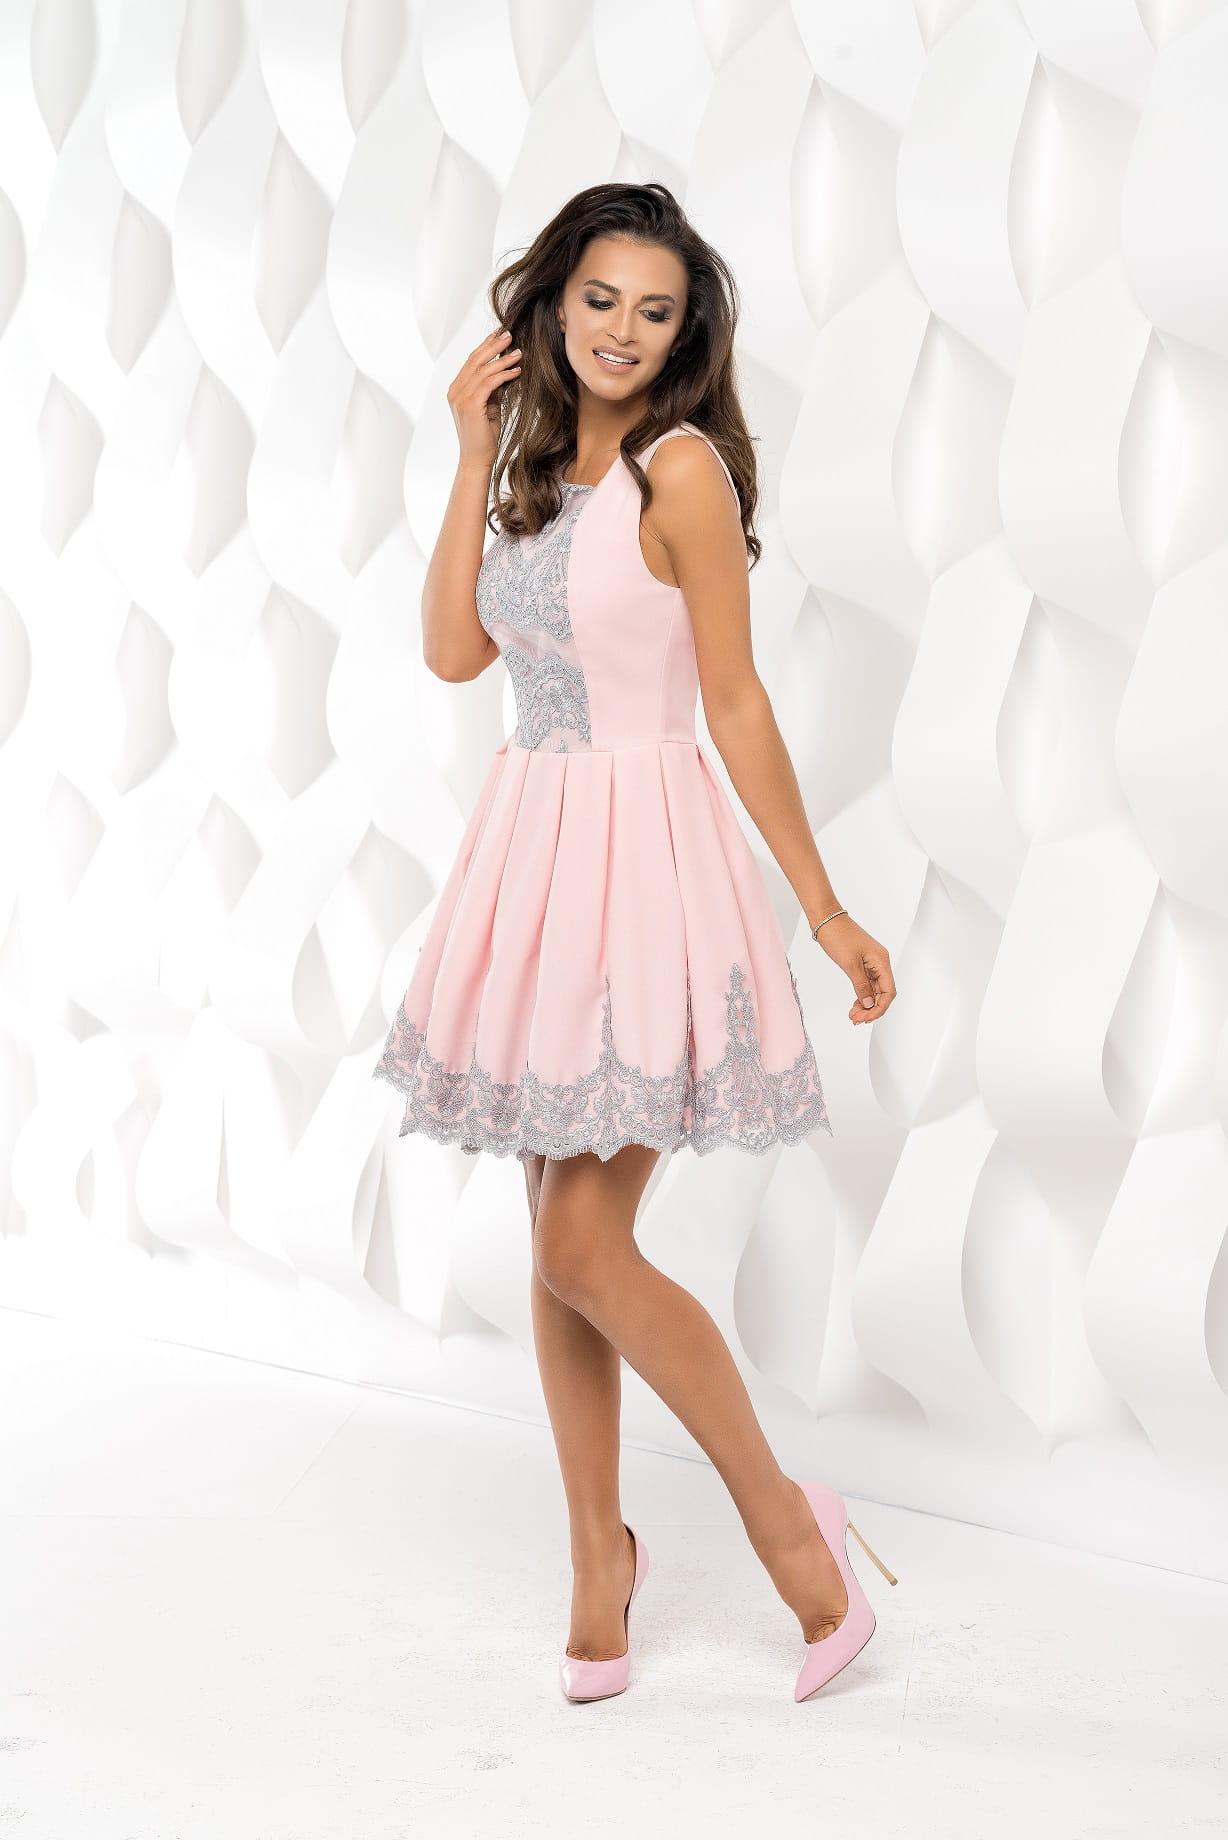 52a539a121 Bicotone sukienka mini koronkowa rozkloszowana